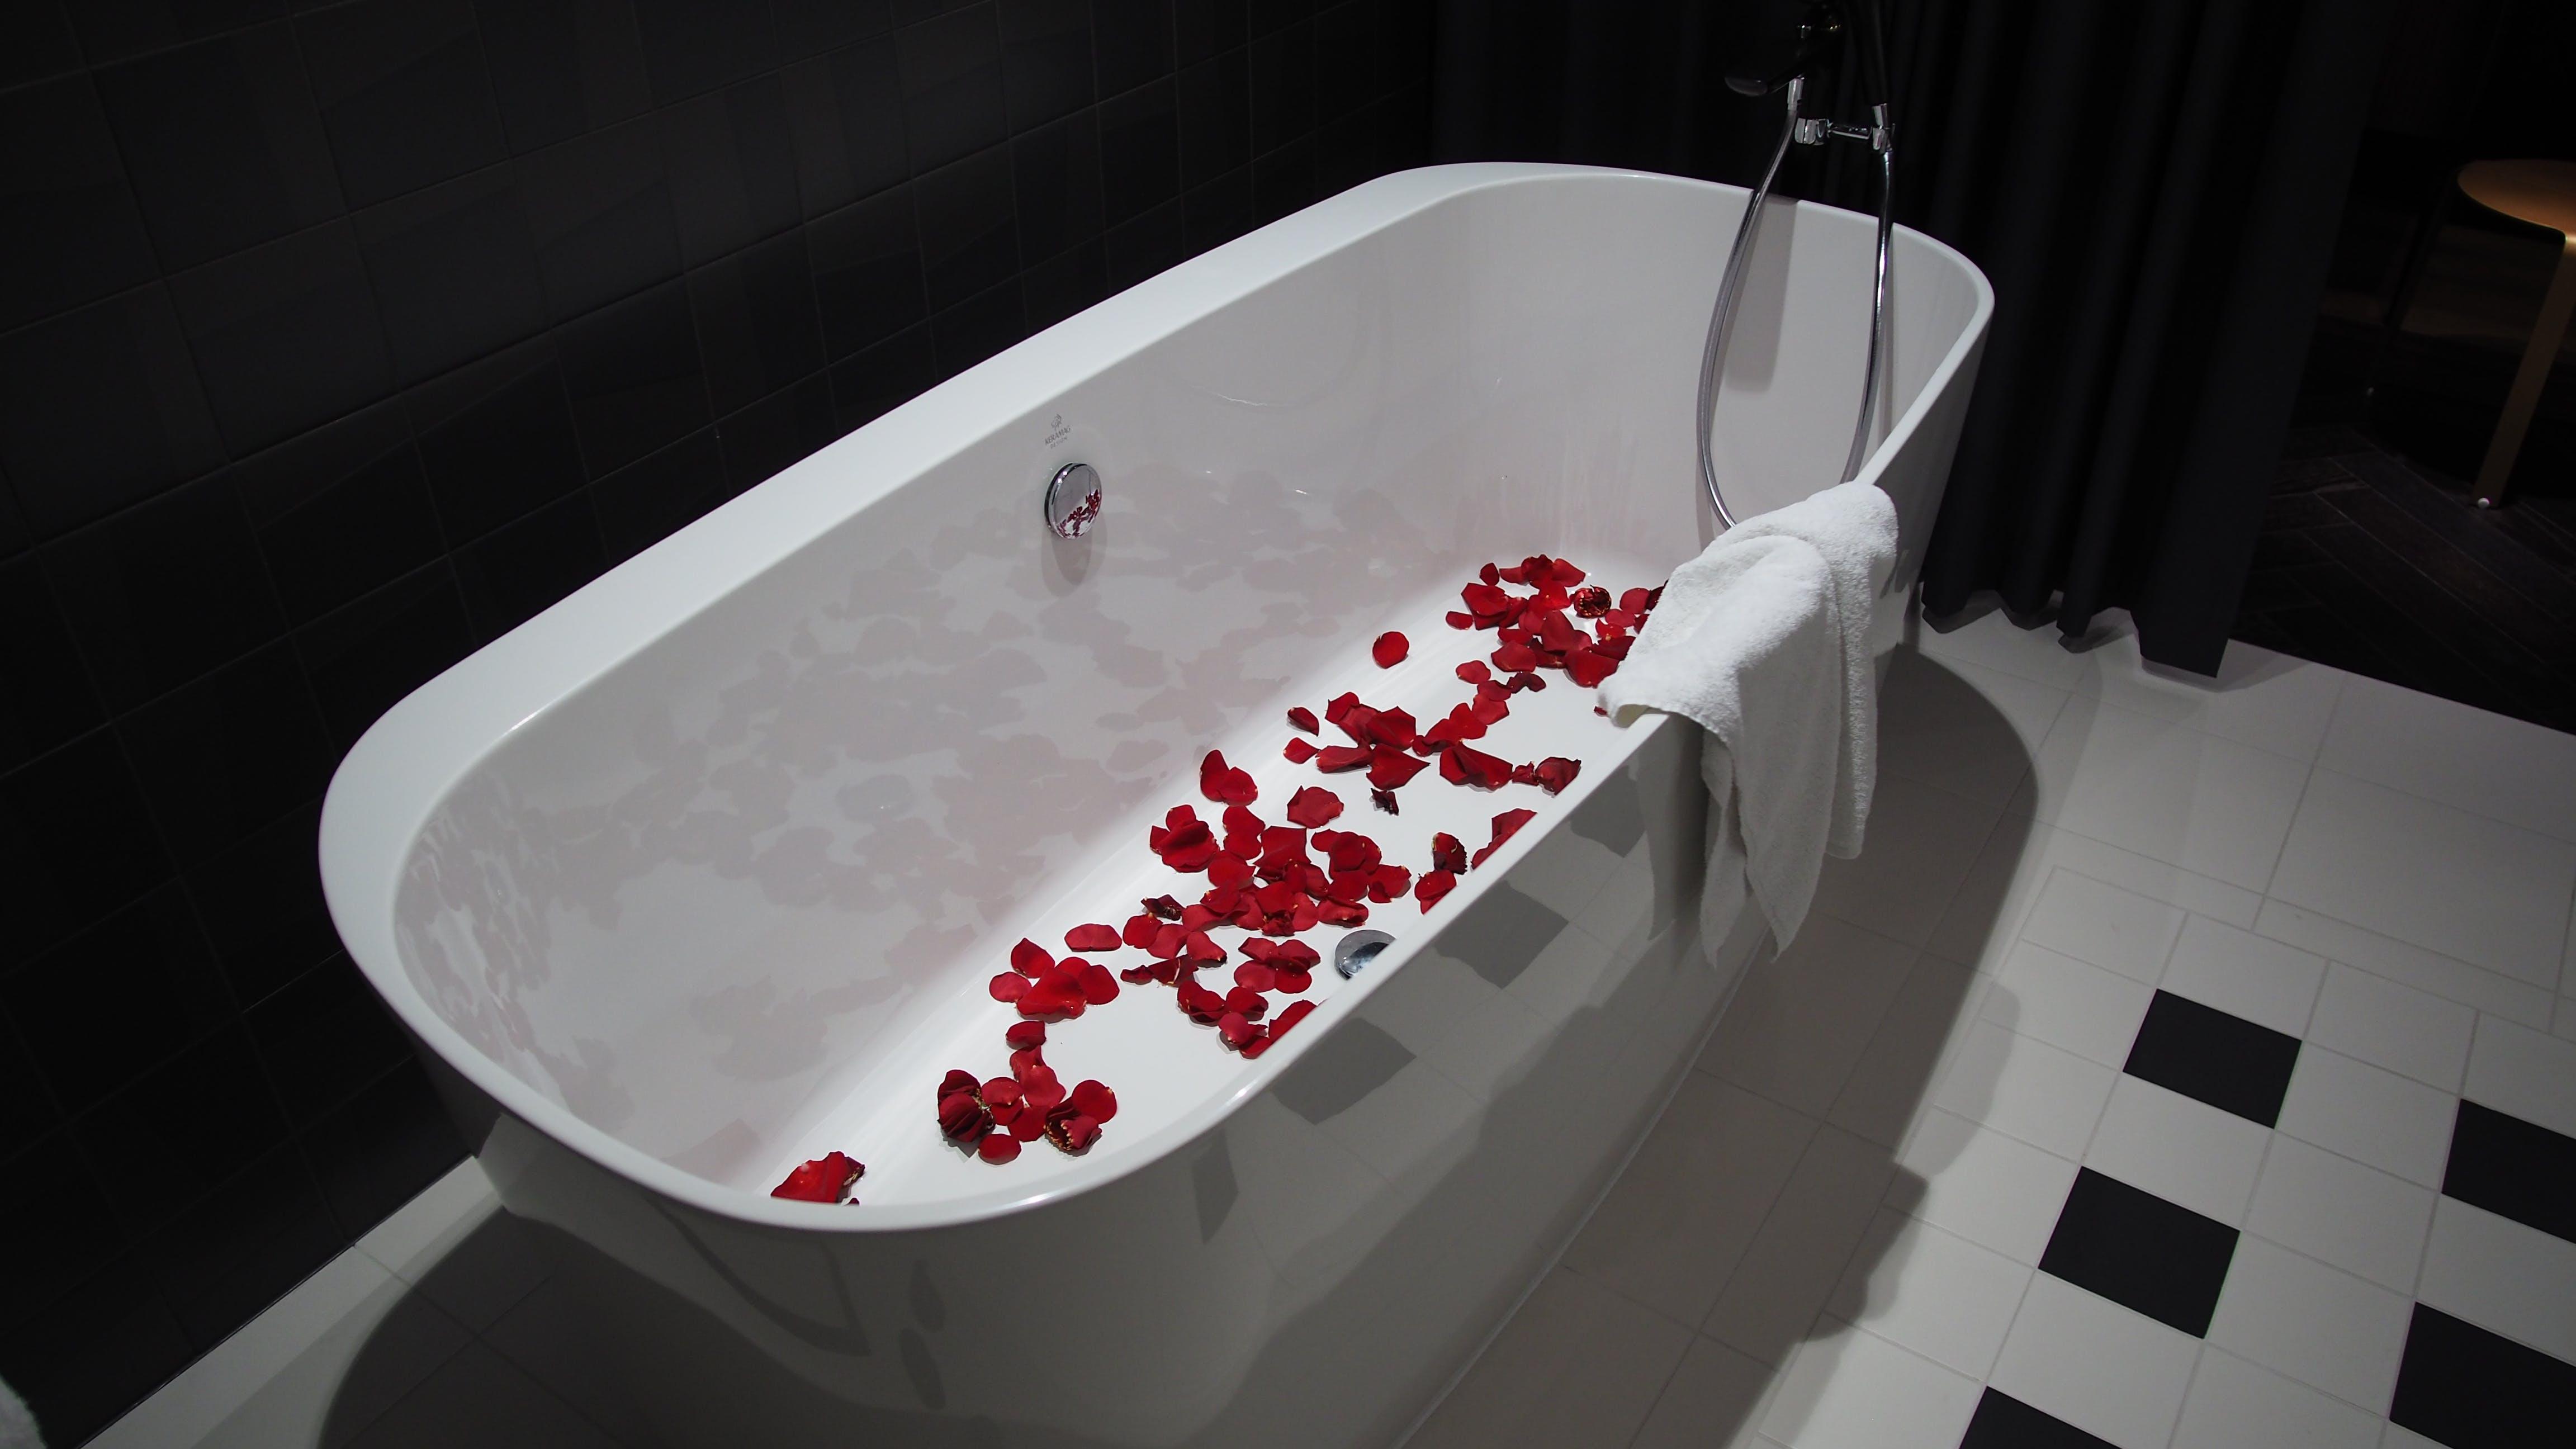 Free stock photo of bathroom, bathtub